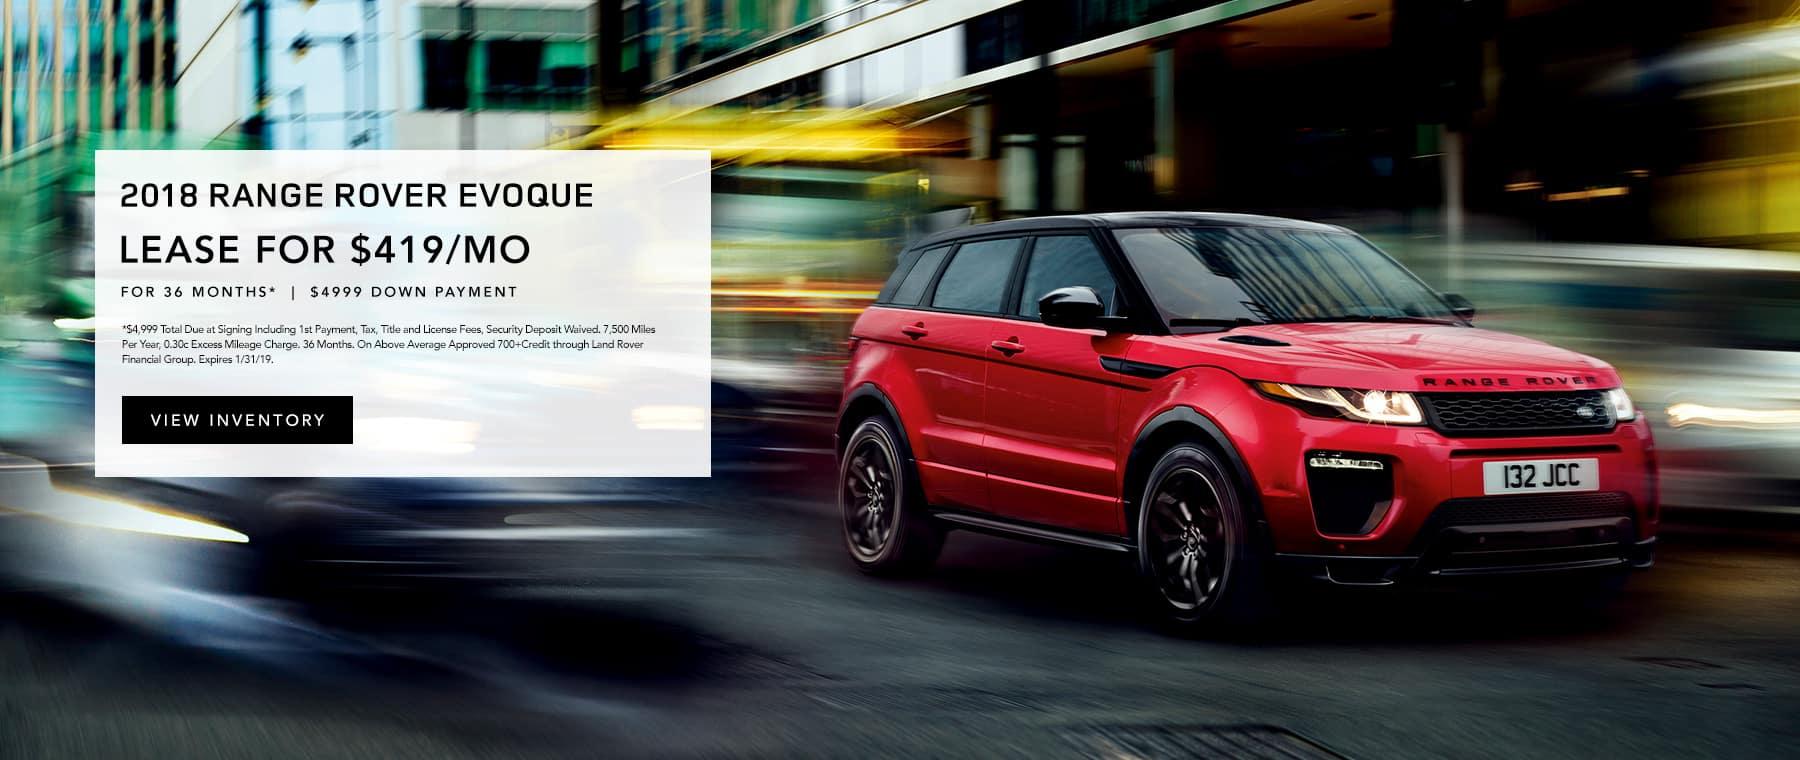 Hornburg Land Rover >> Land Rover Dealer In West Hollywood Ca Hornburg Land Rover Los